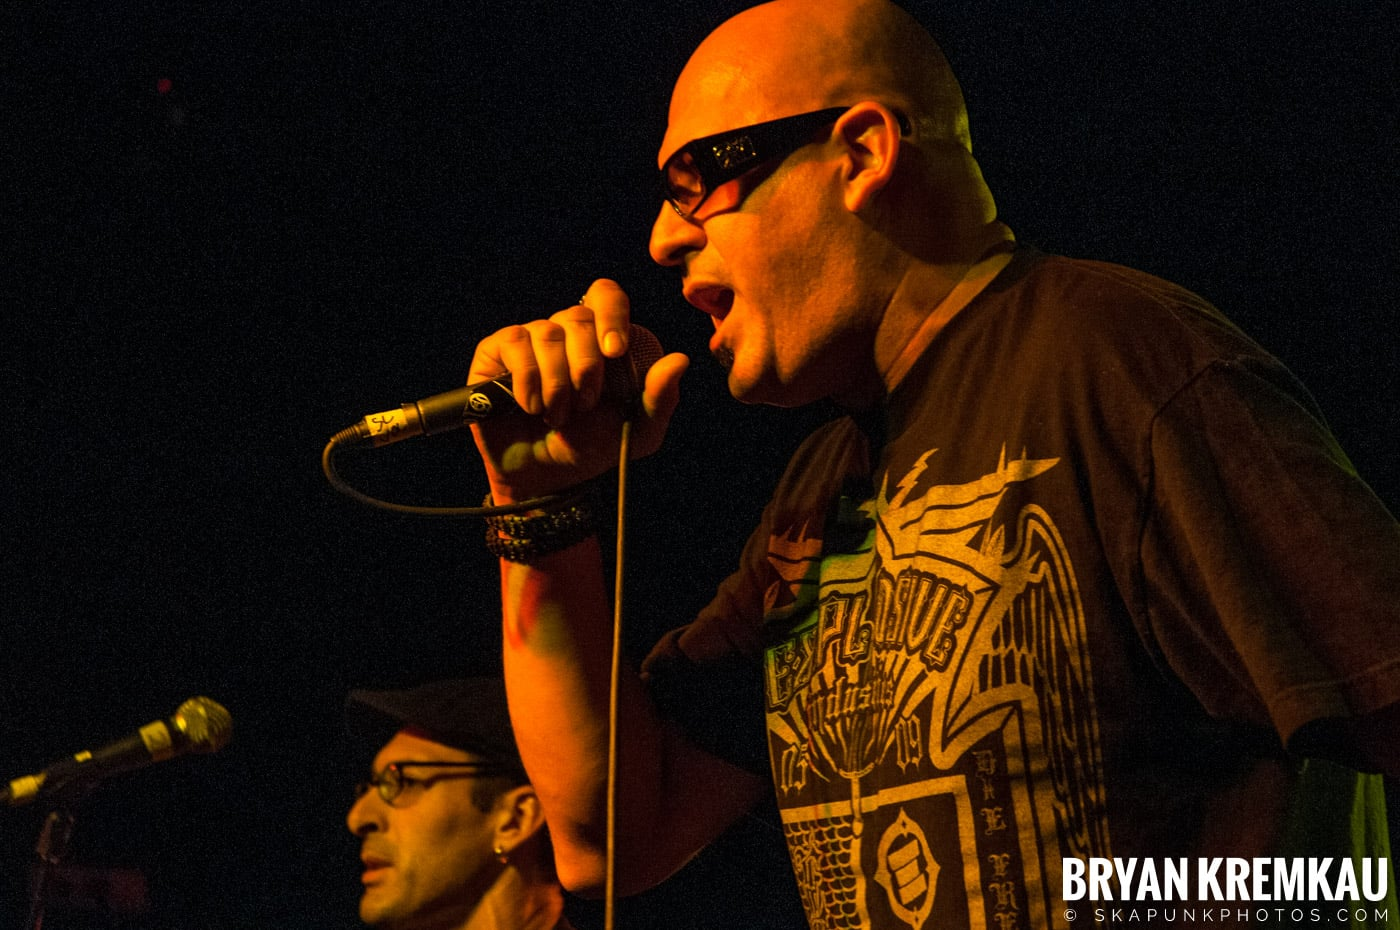 Voodoo Glow Skulls (Ska is Dead Tour) @ Starland Ballroom, Sayreville, NJ - 11.15.09 (7)